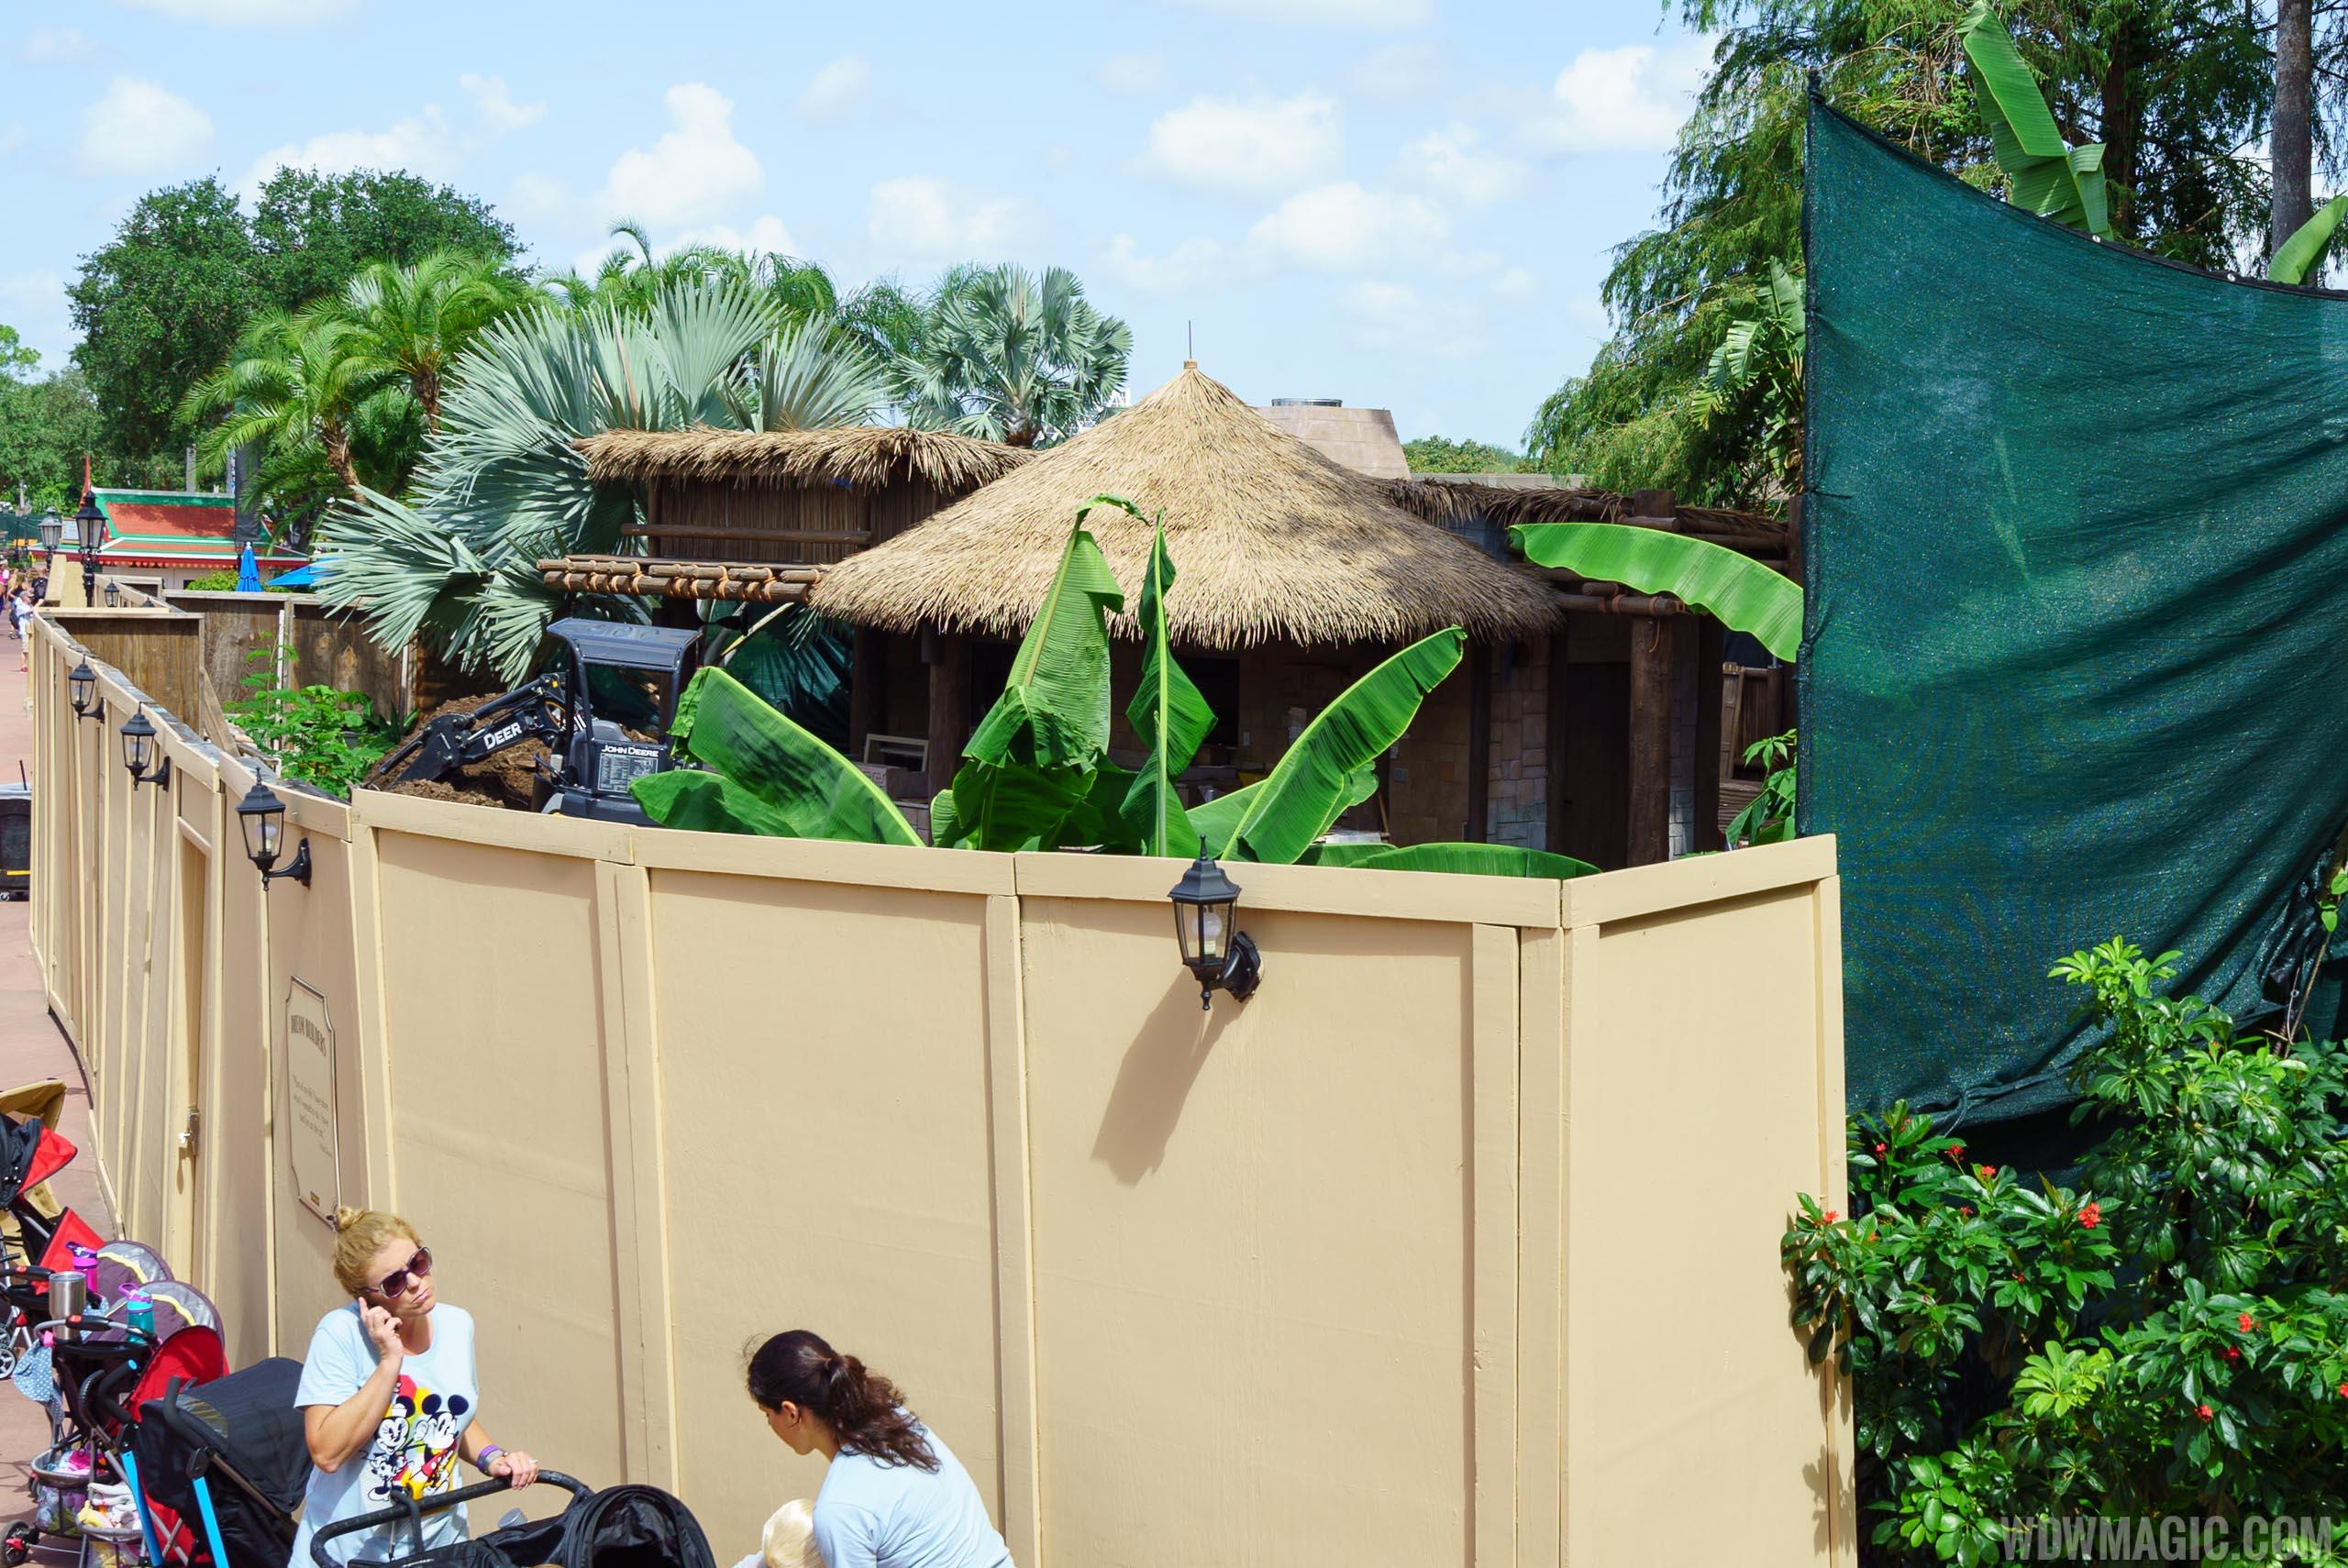 Choza de Margarita kiosk under construction in August